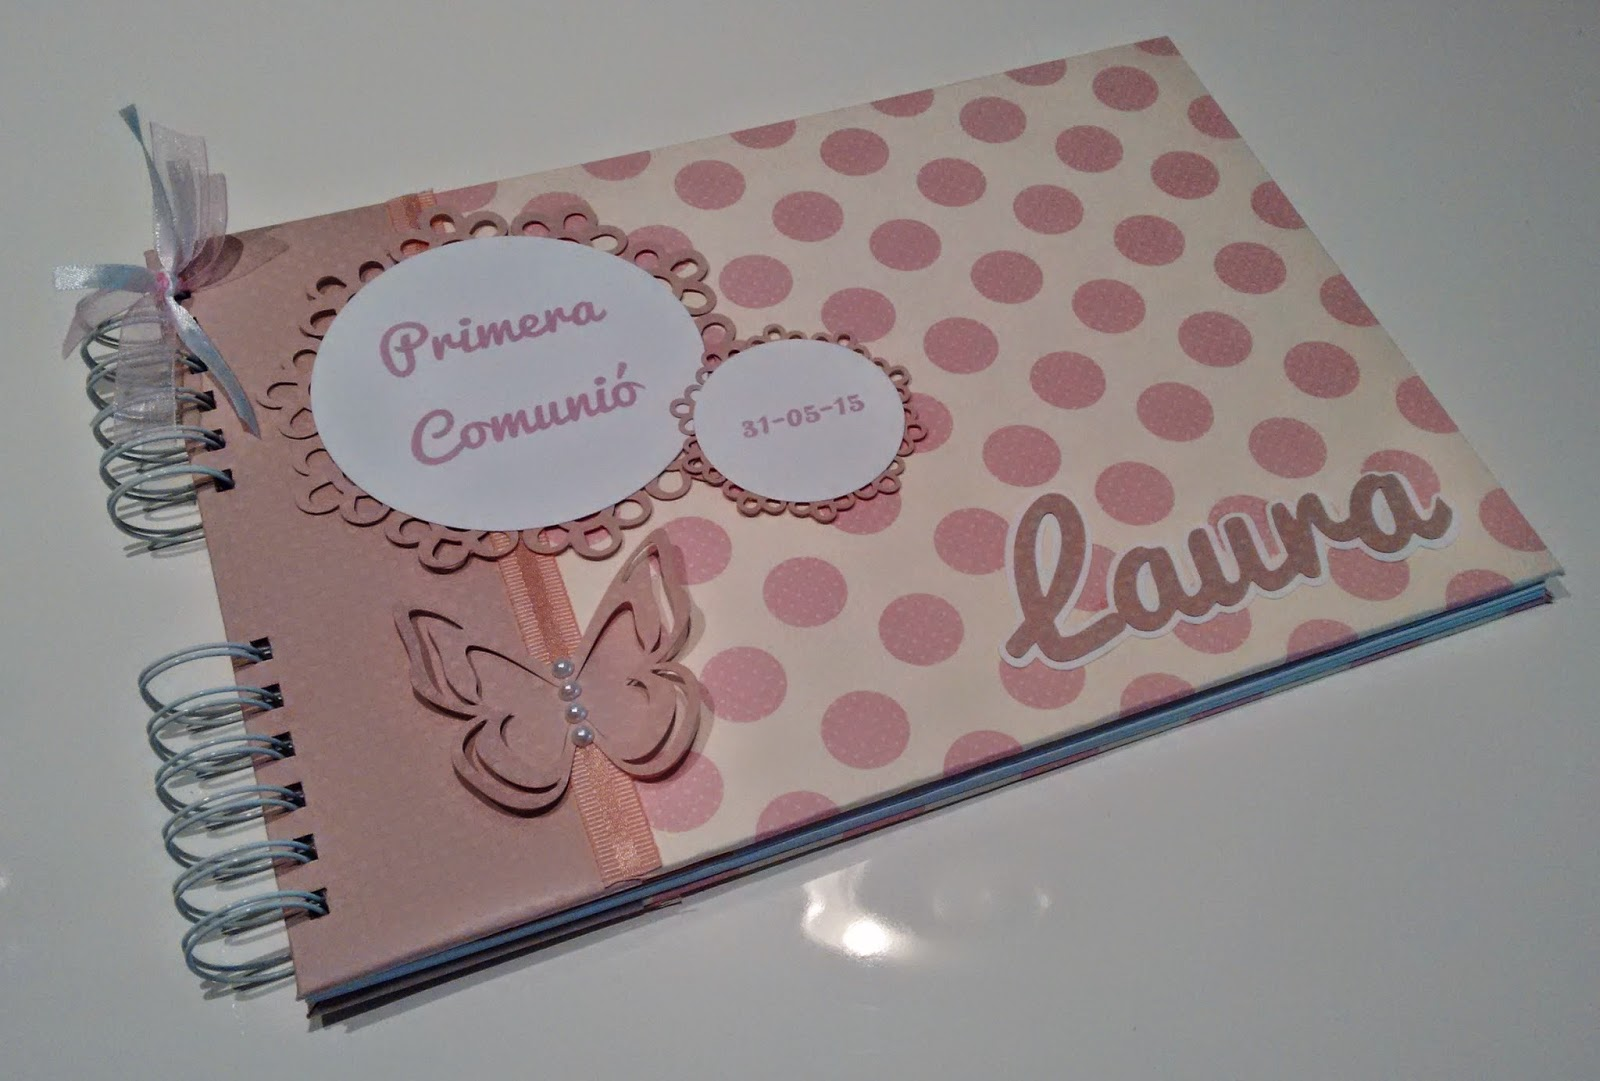 Somnisdscrap libro de firmas laura for Interior libro de firmas comunion